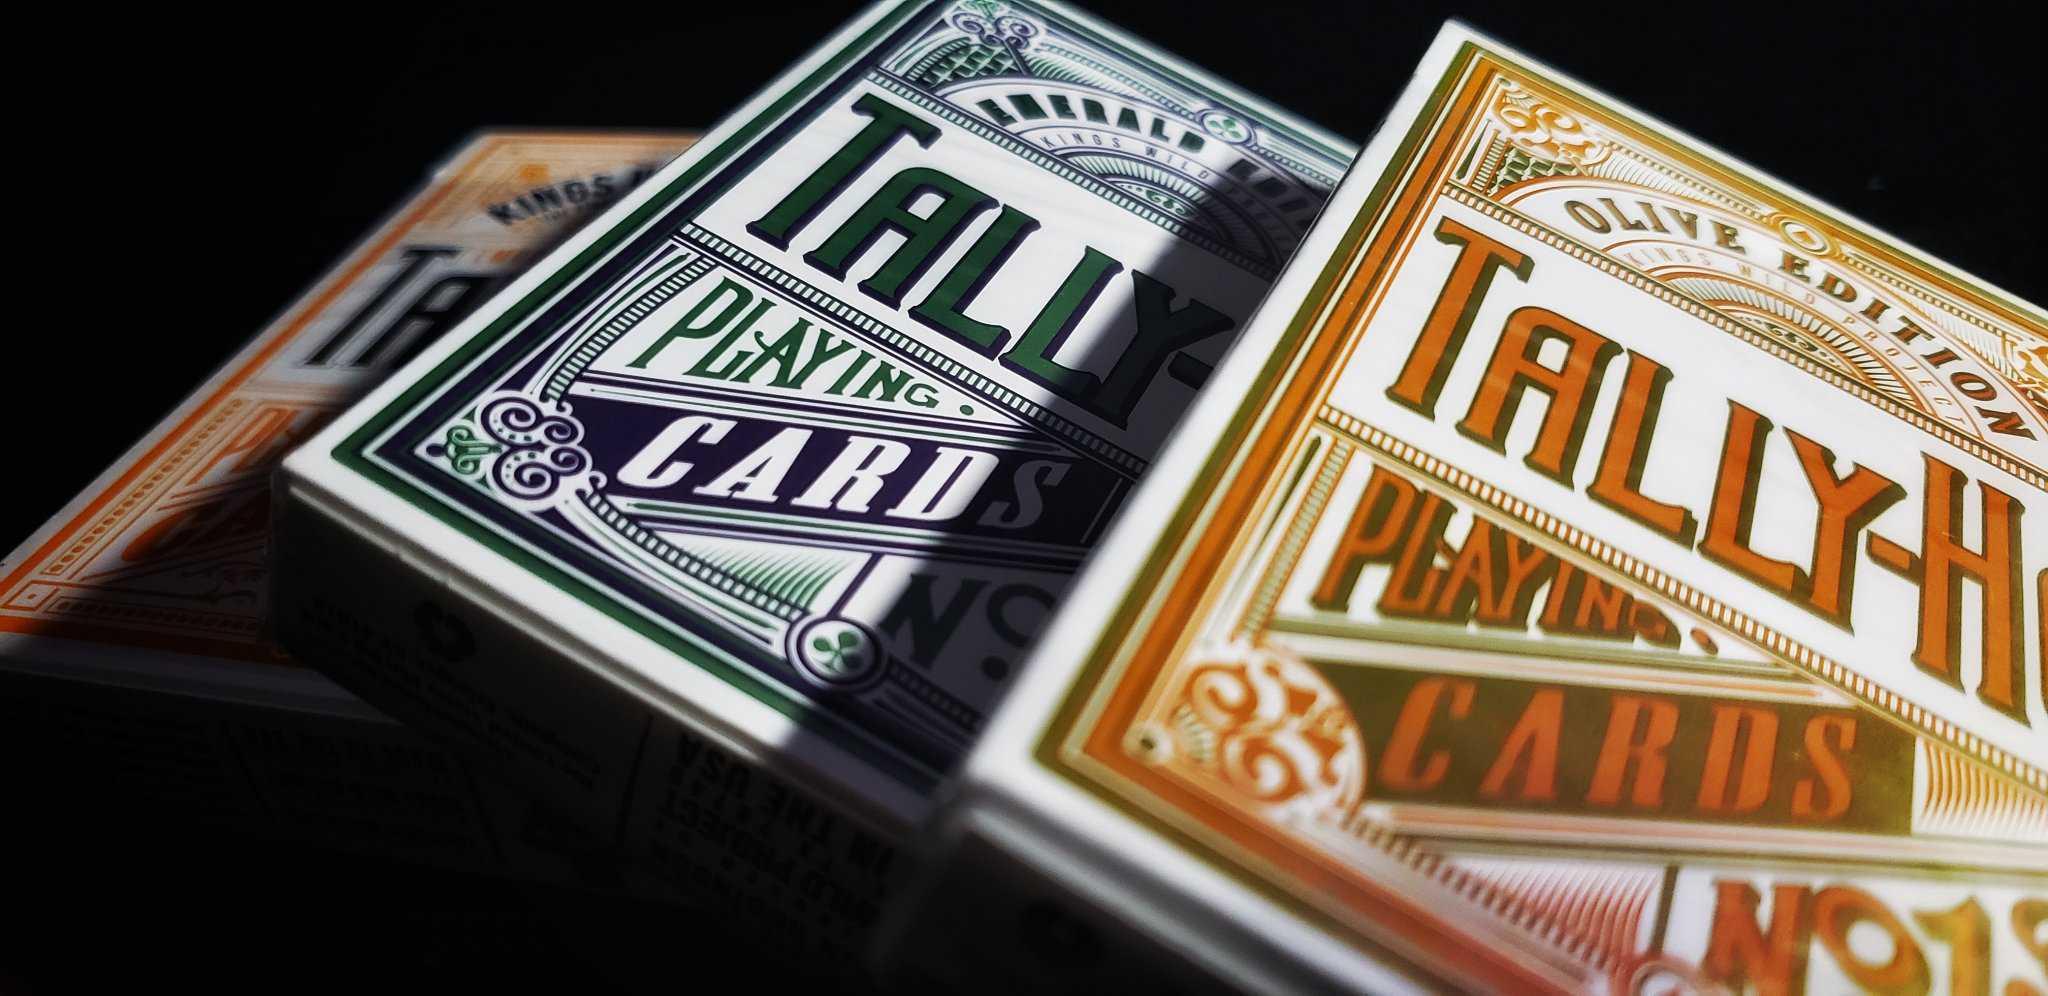 Photo shoot of the kings wild Tally Ho decks IG:@k13pt0 20190821_073417-0120190821_073332-04-0220190